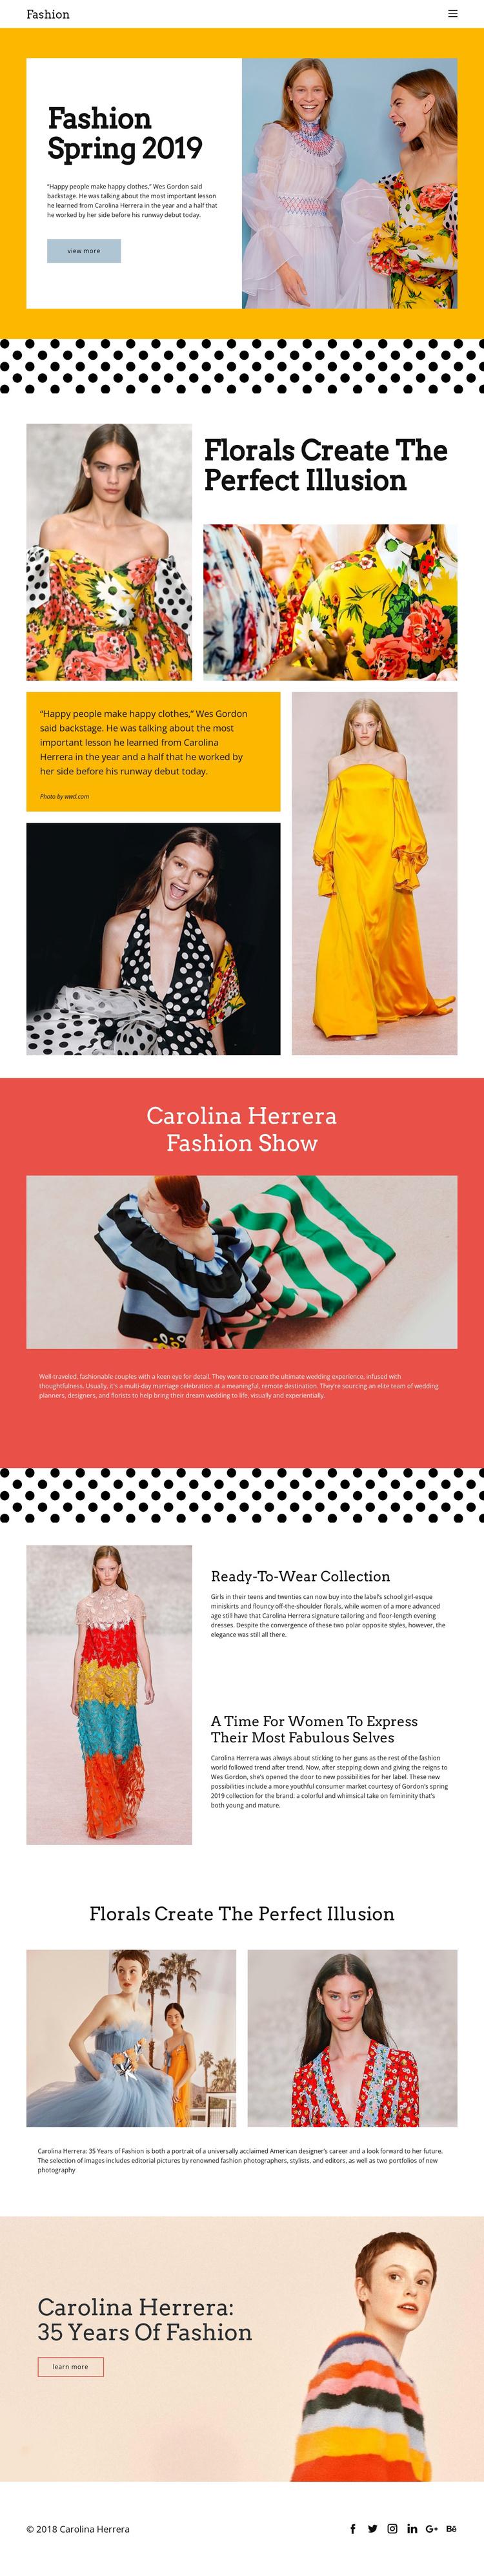 Fashion Spring Joomla Template